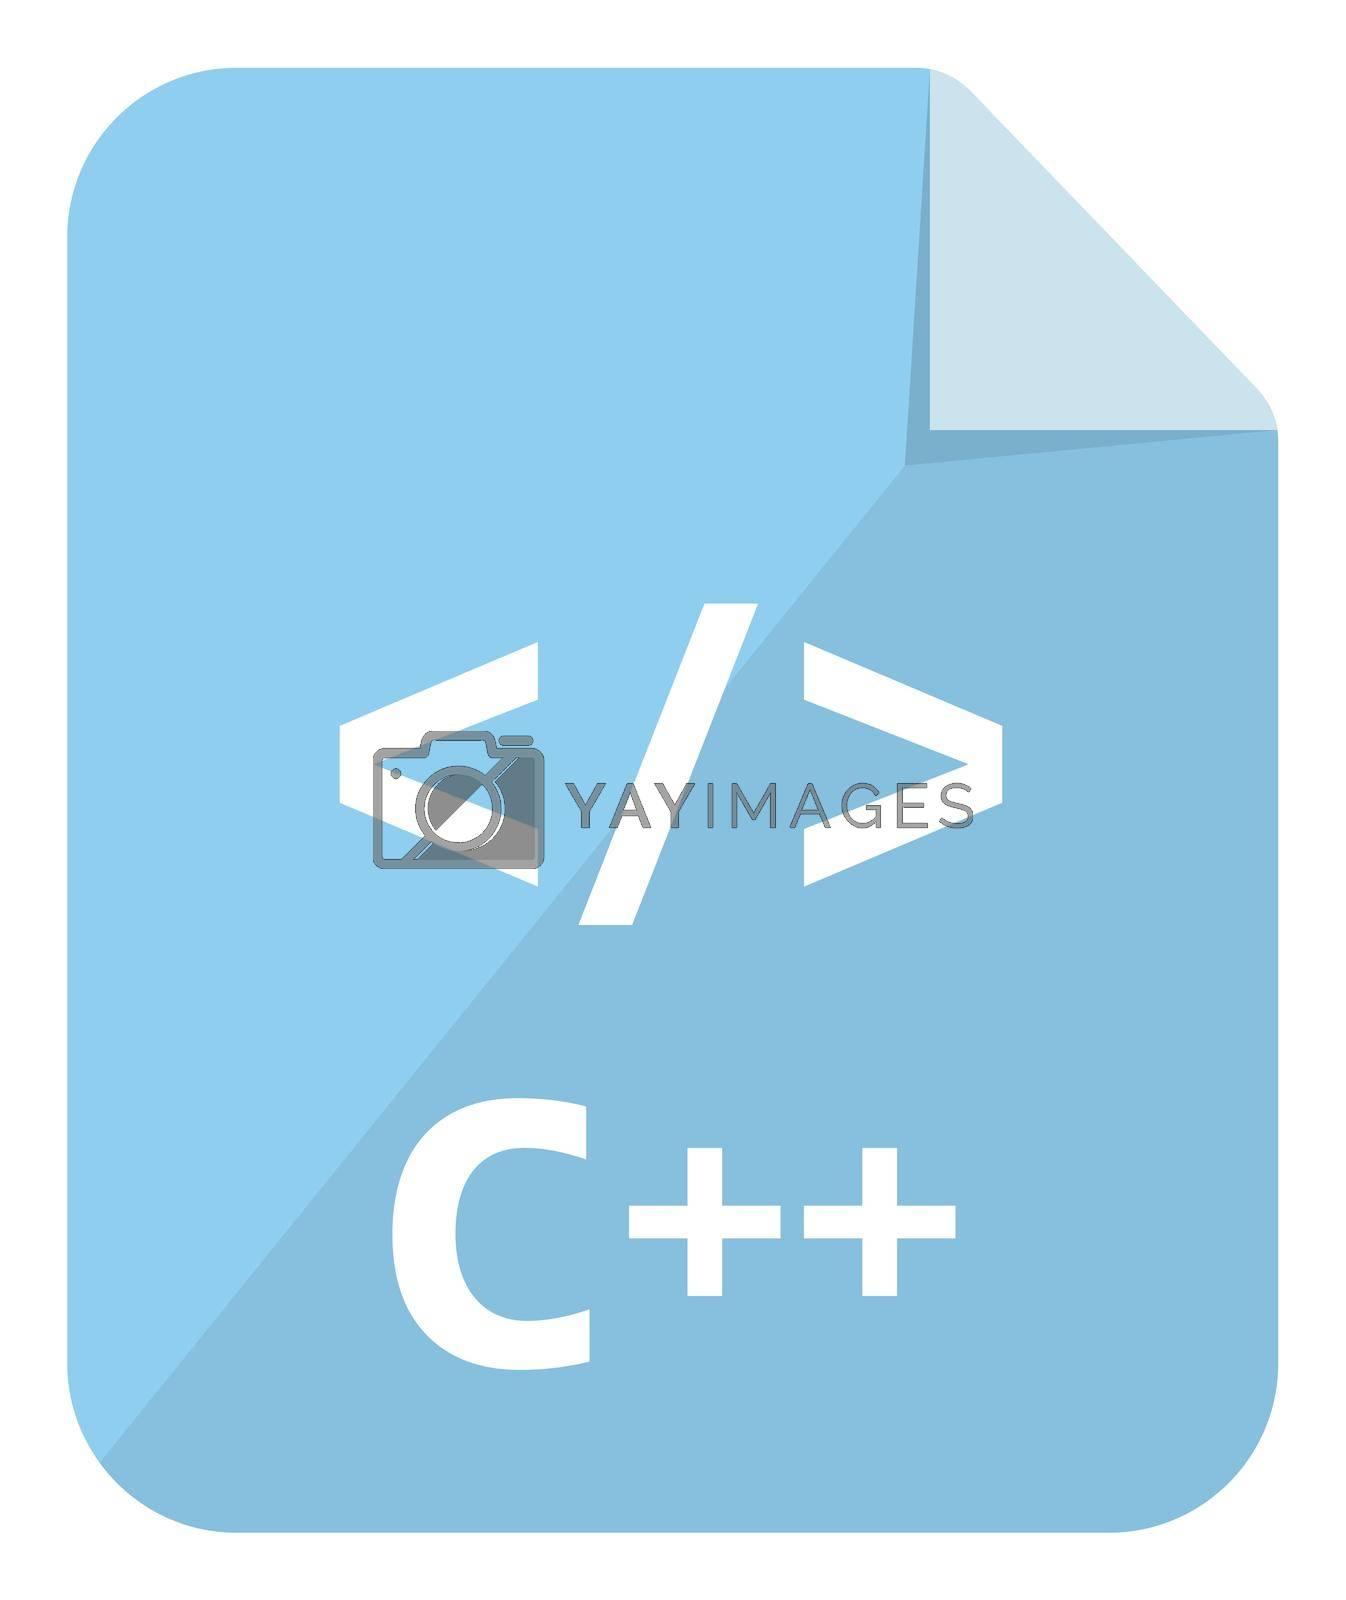 C ++ icon   Major programming language vector icon illustration  ( color version )